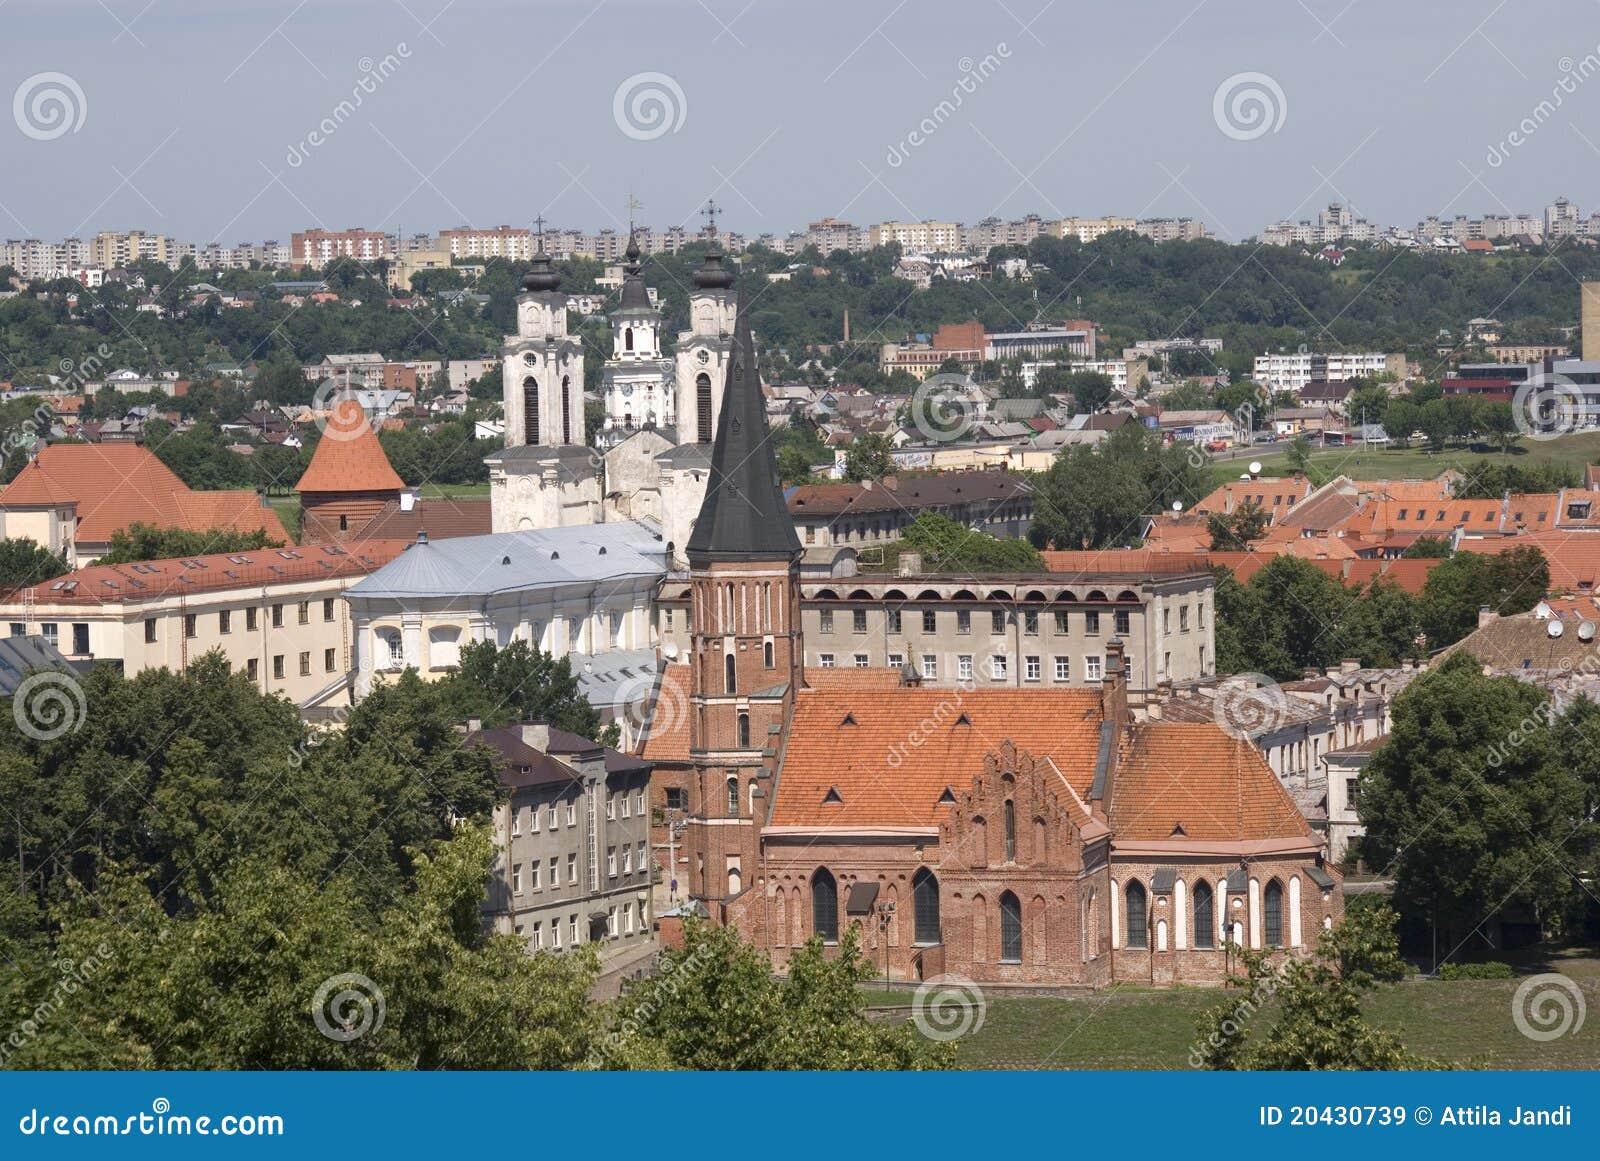 Download Vytautas Church, Kaunas, Lithuania Stock Image - Image of attraction, baltic: 20430739